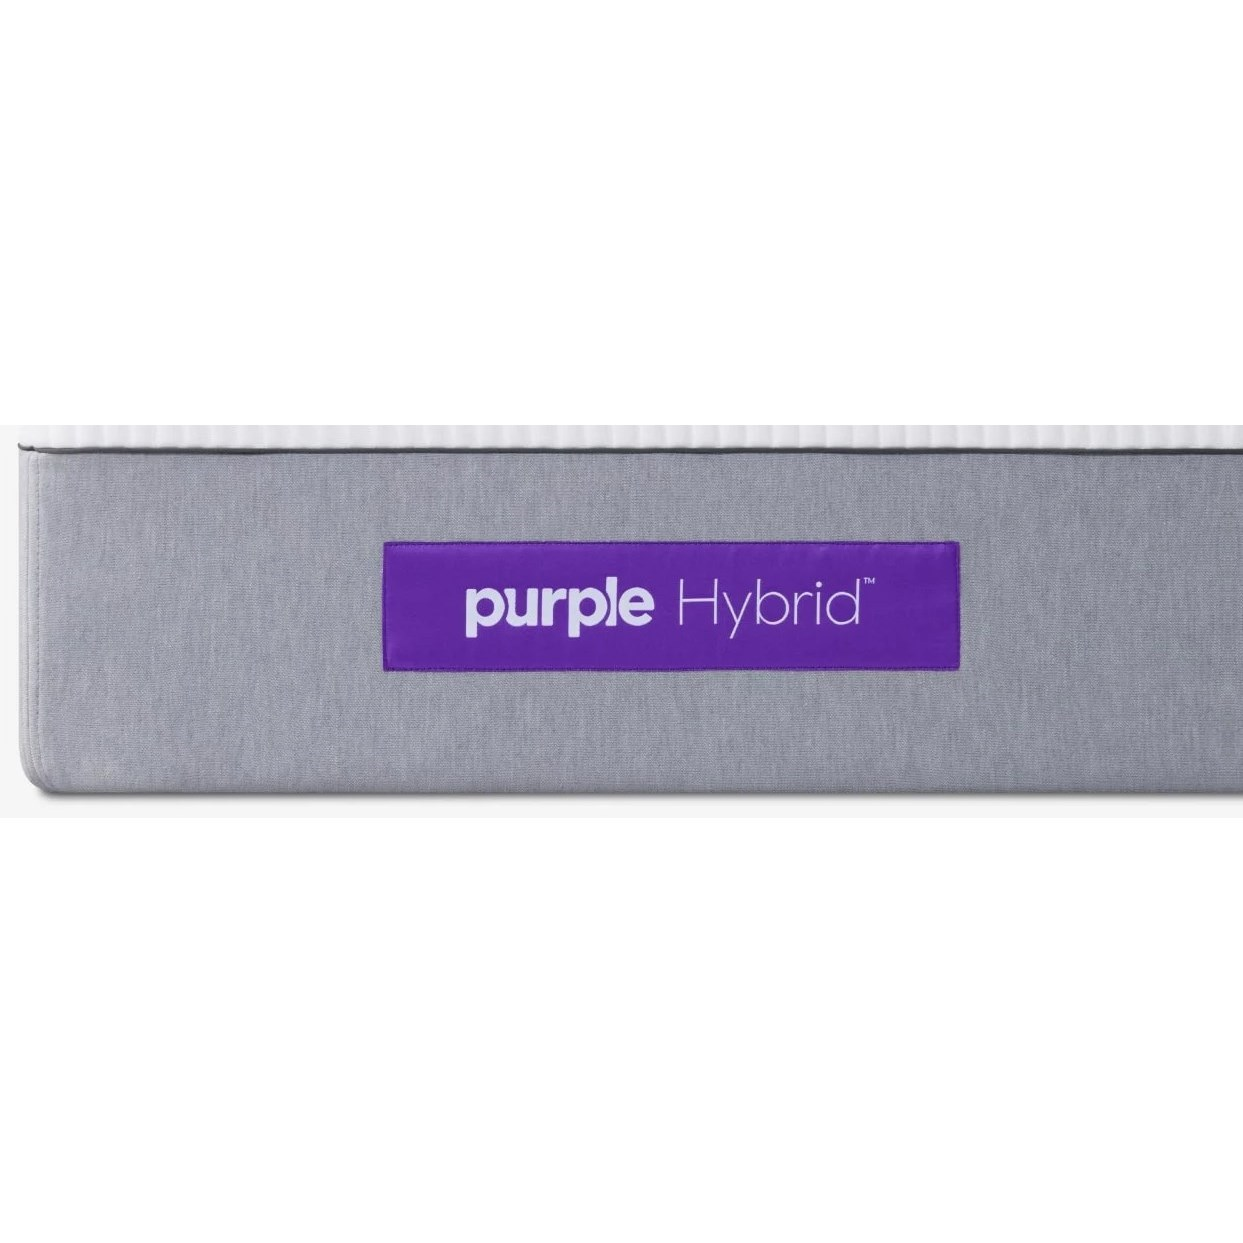 "Purple Hybrid King 11"" Purple Hybrid Mattress by Purple at Furniture and ApplianceMart"